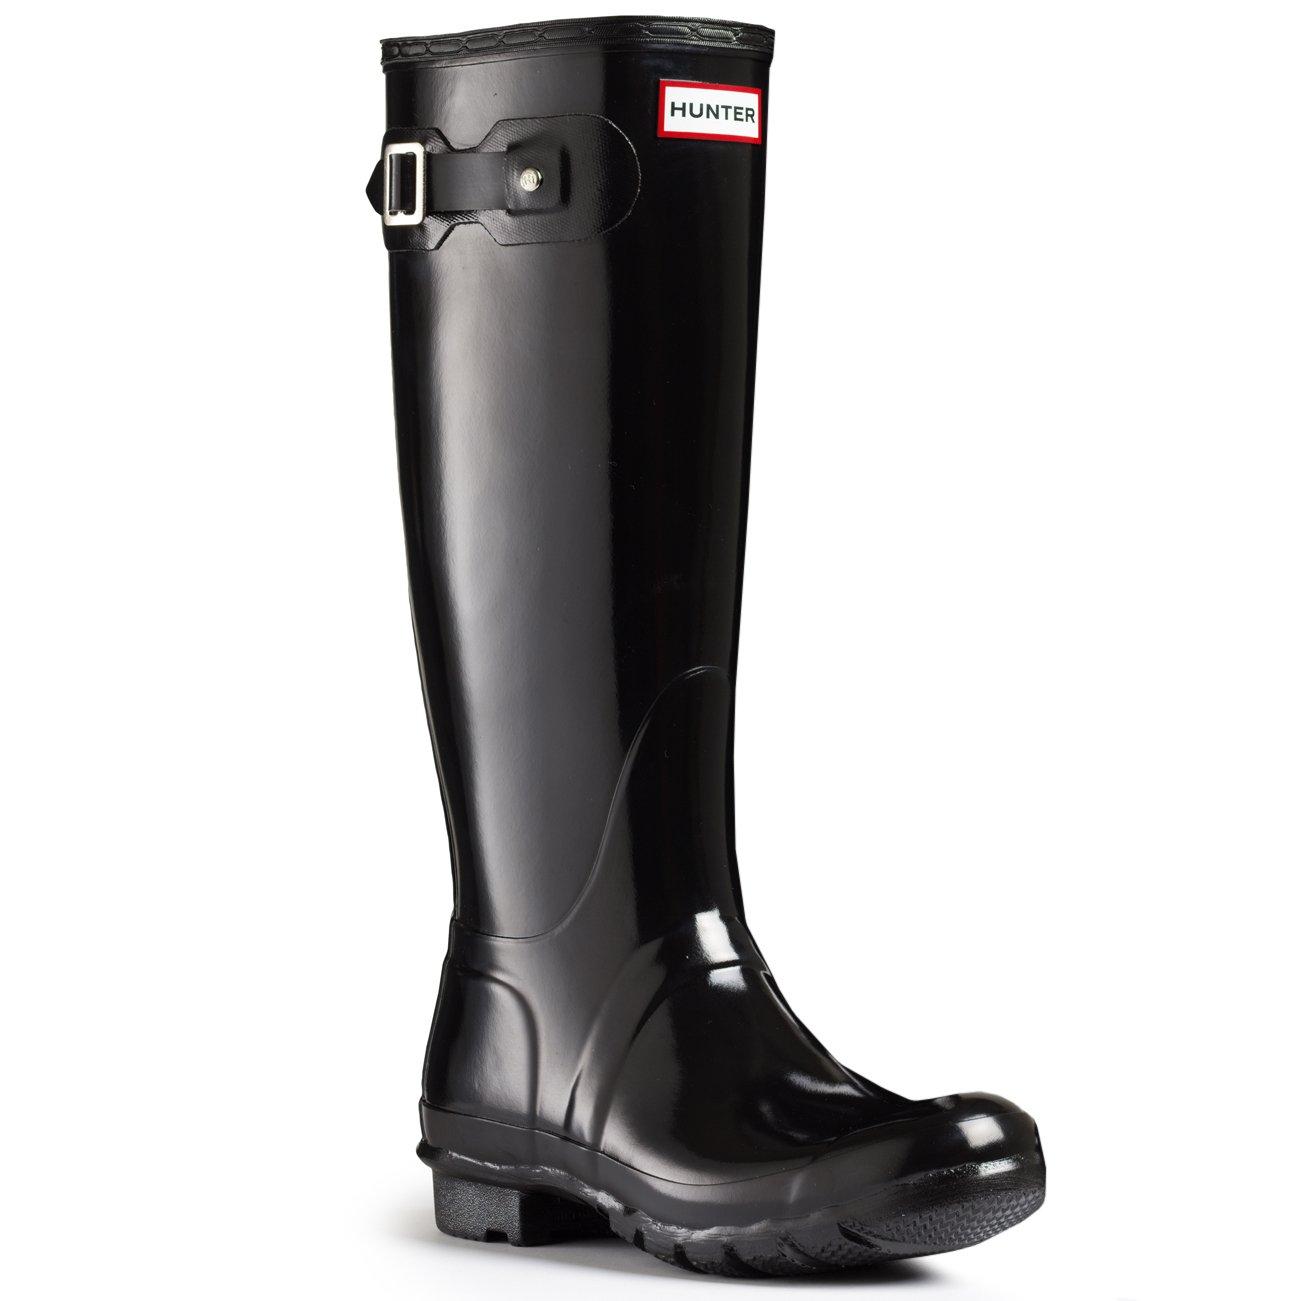 Hunter Women's Original Tall Rain Boot,Black Gloss,9 B(M) US